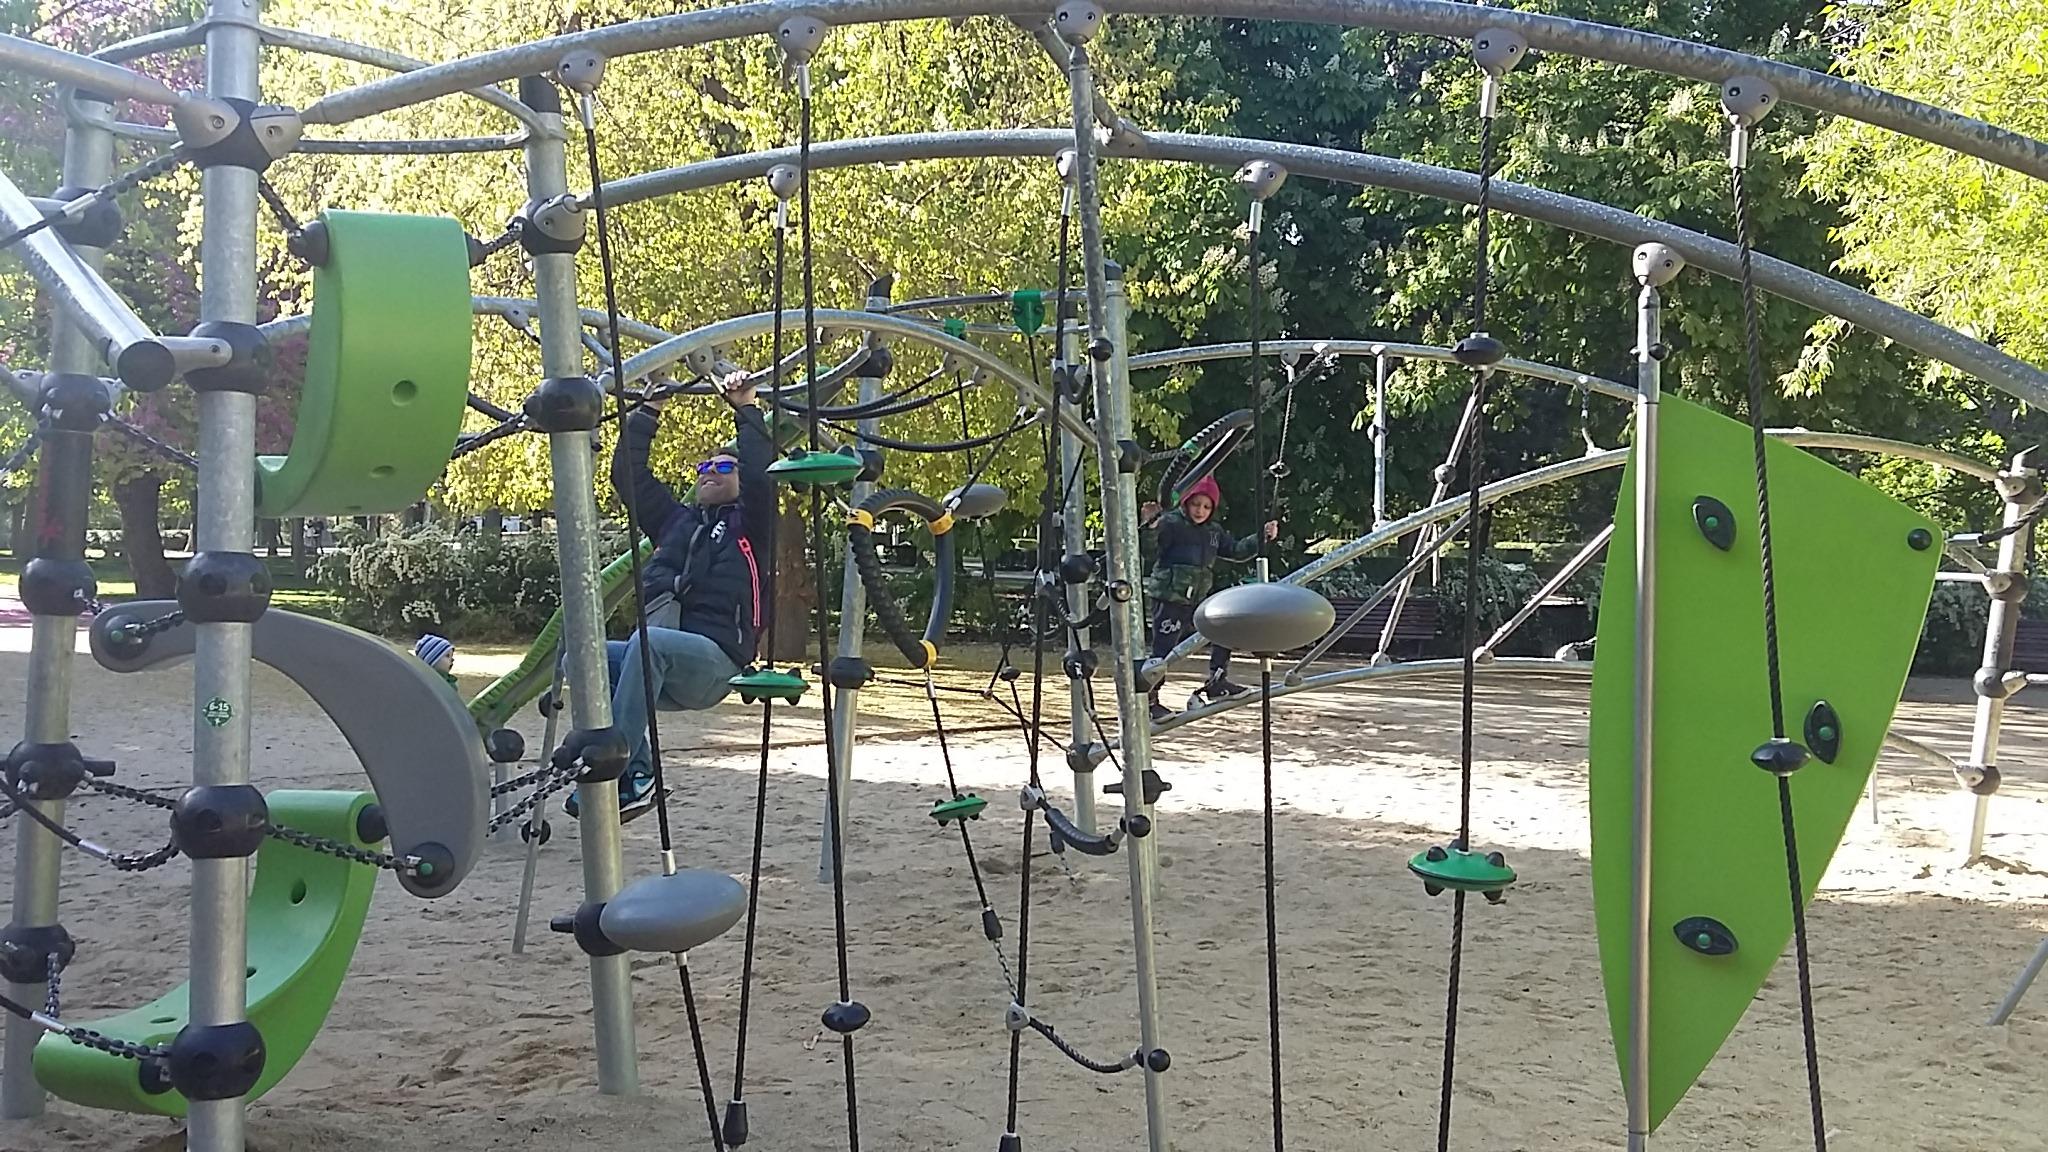 [cml_media_alt id='14651']Madrid on bambini[/cml_media_alt]